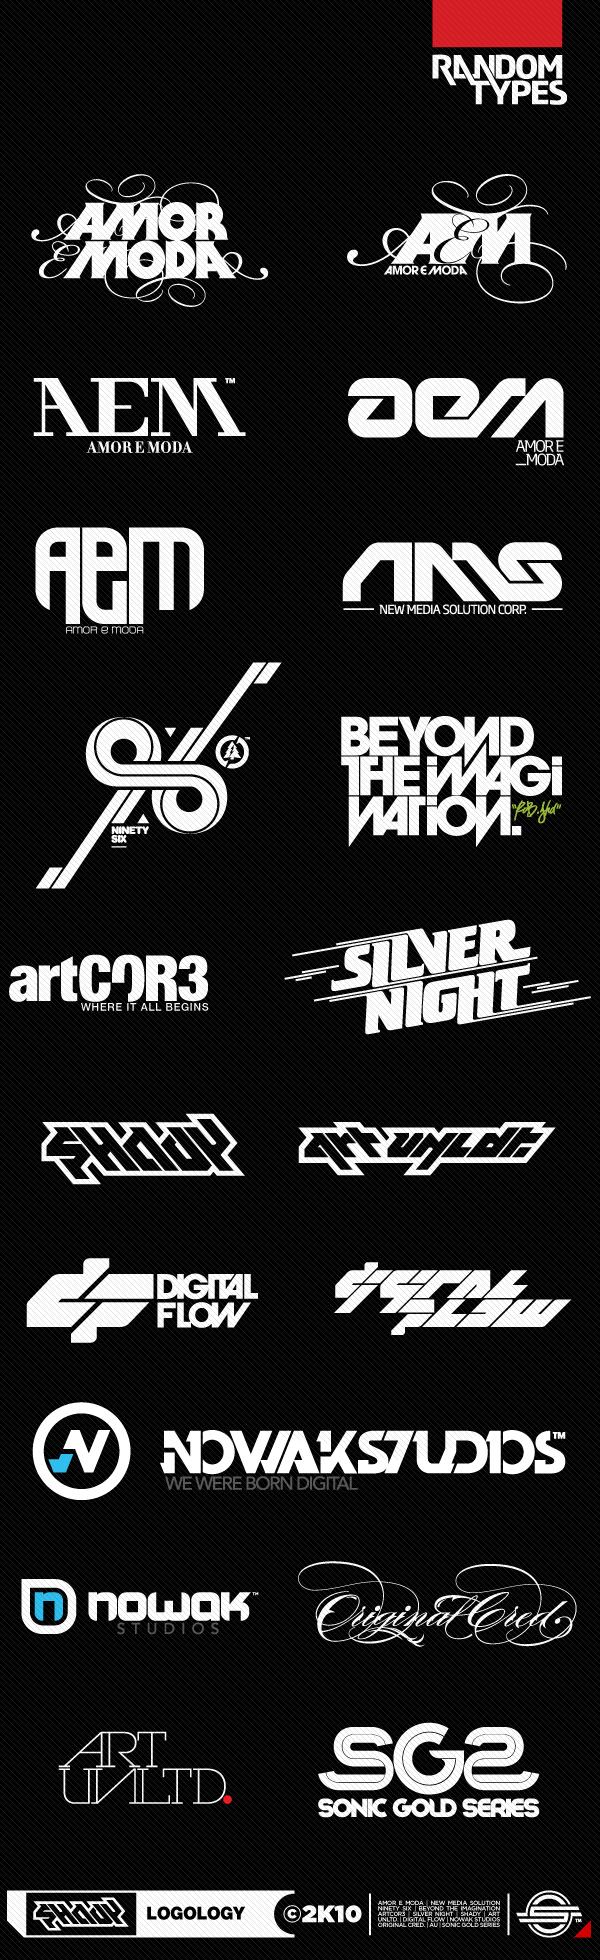 logos logo random types 5 shady art unltd. amor e moda AEM nms 96 beyond the imagination artcore silver night digital flow NOWAK STUDIOS ORIGINAL CRED.